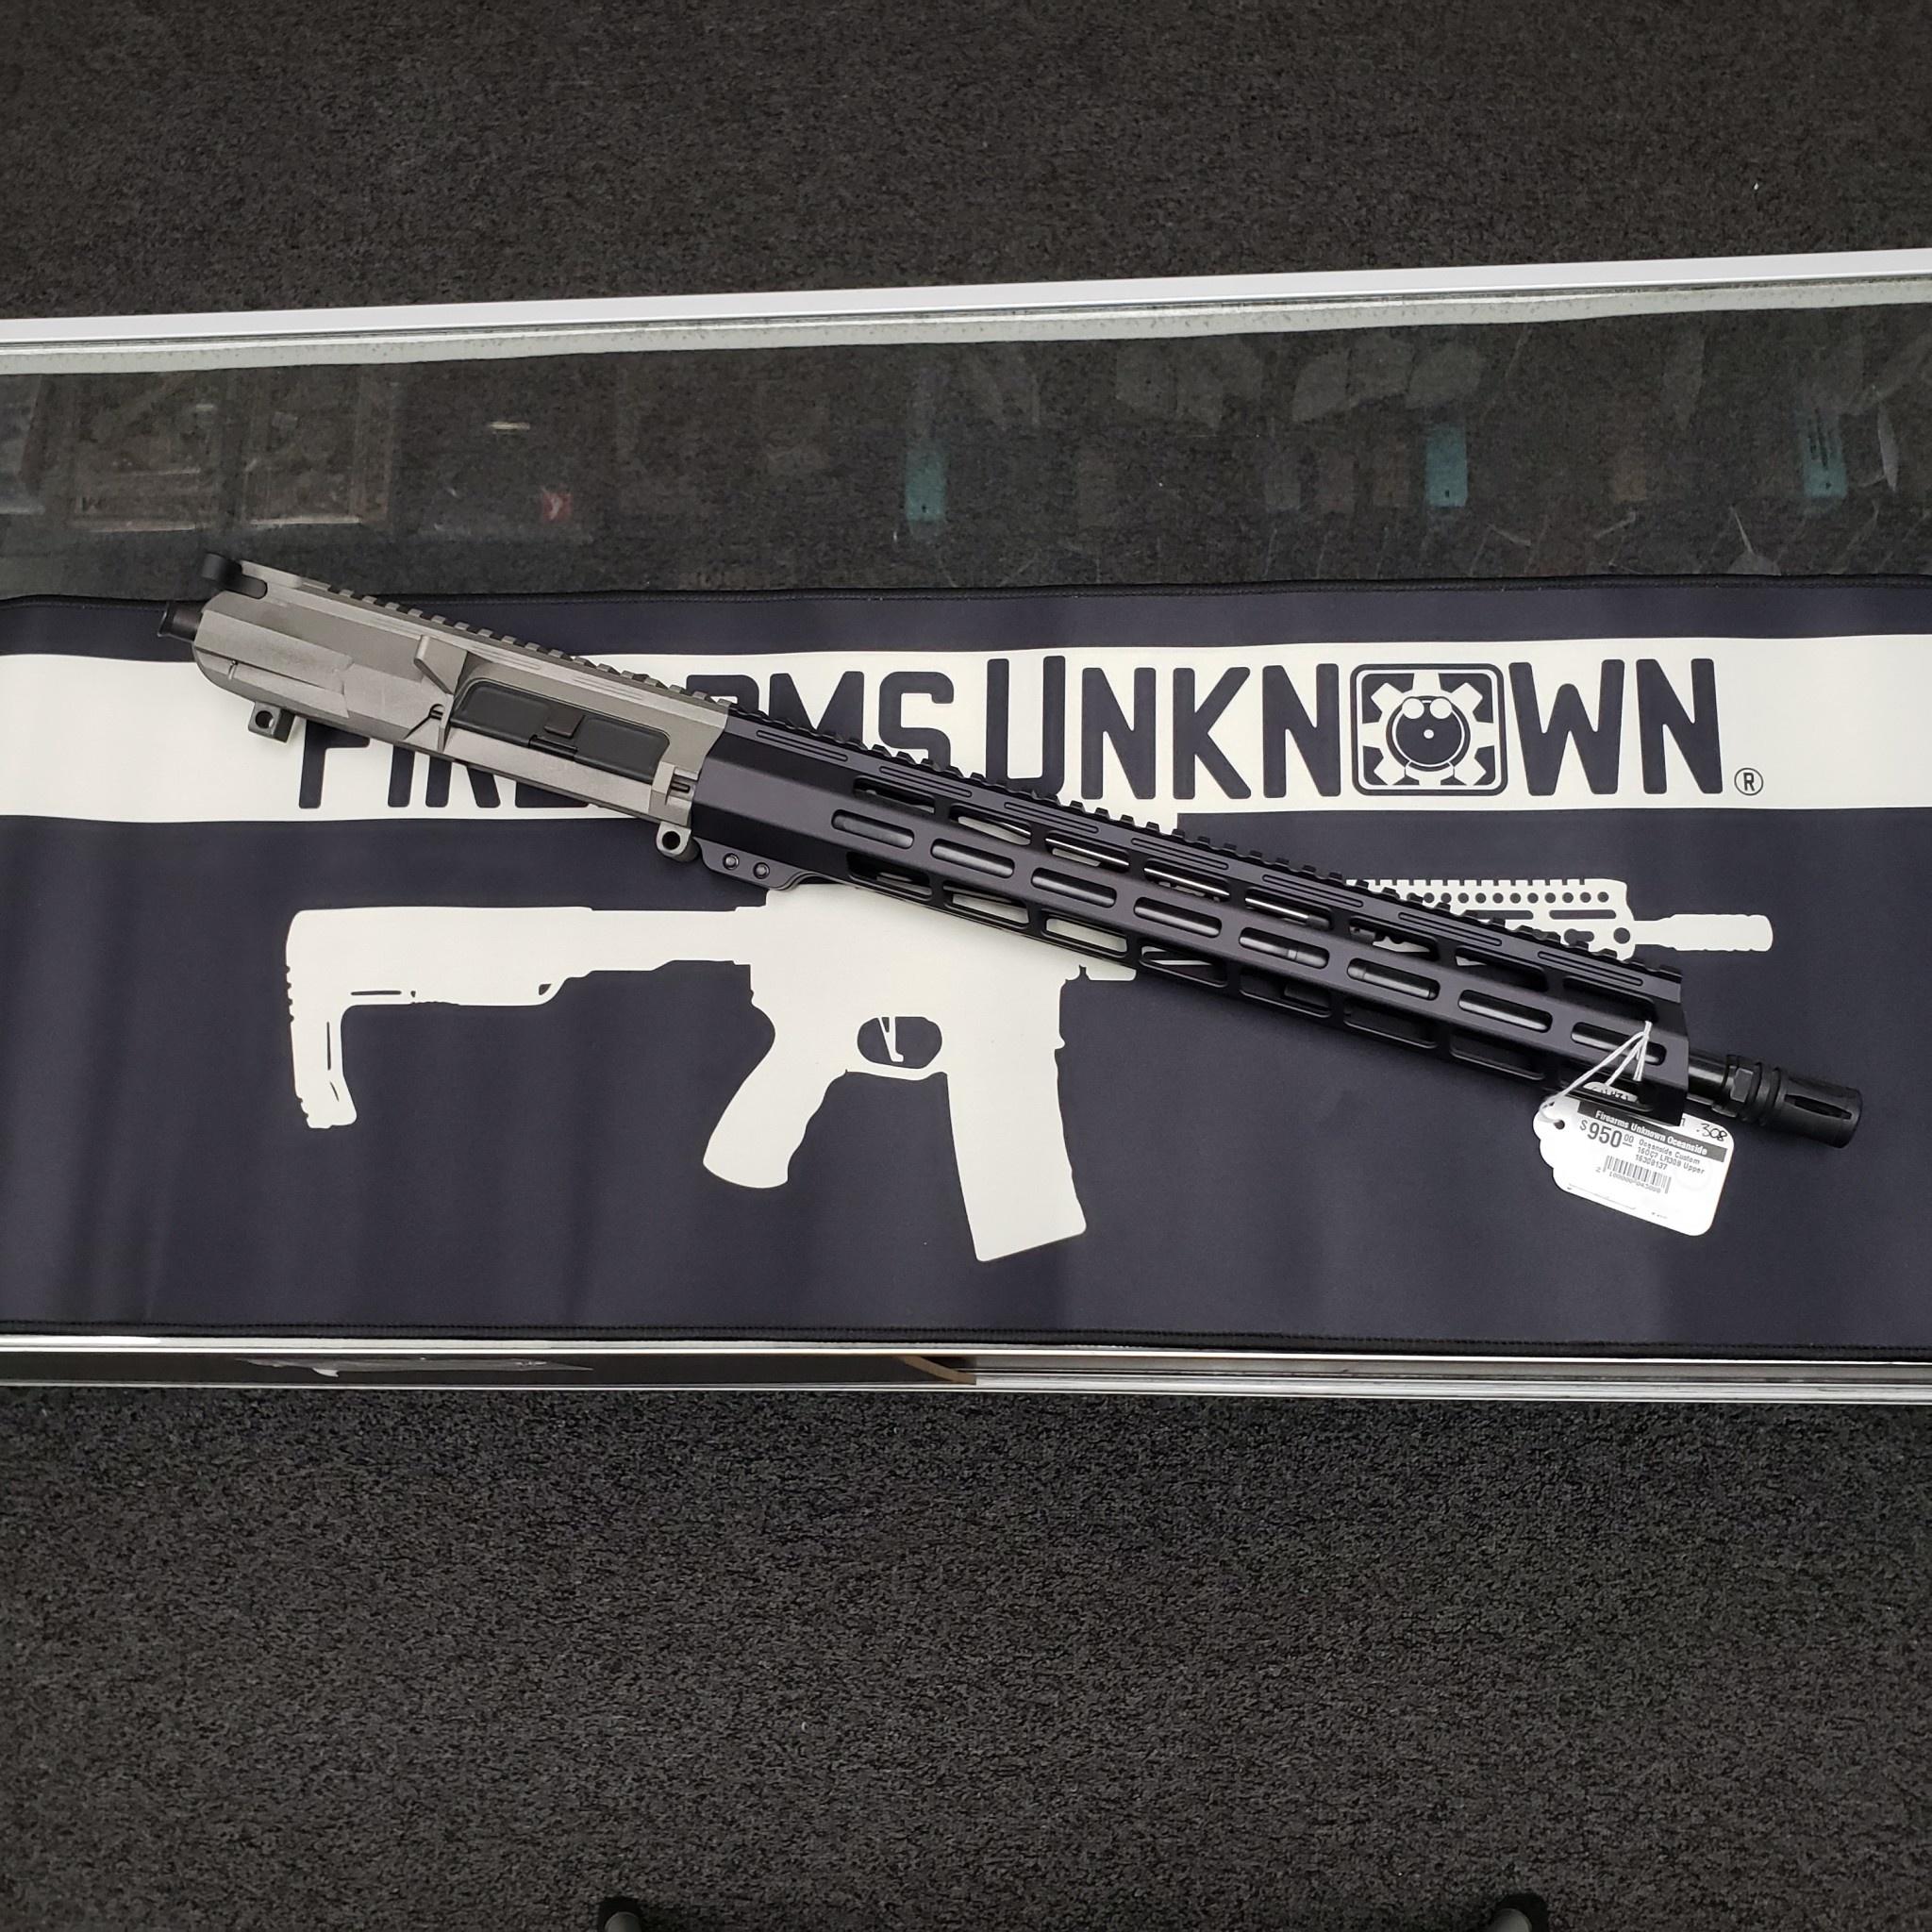 "Oceanside Custom 16"" 308Win 1:10 Rifle Length Blk Krait Mlok Upper w/ A2 Flash Hider 16308137"